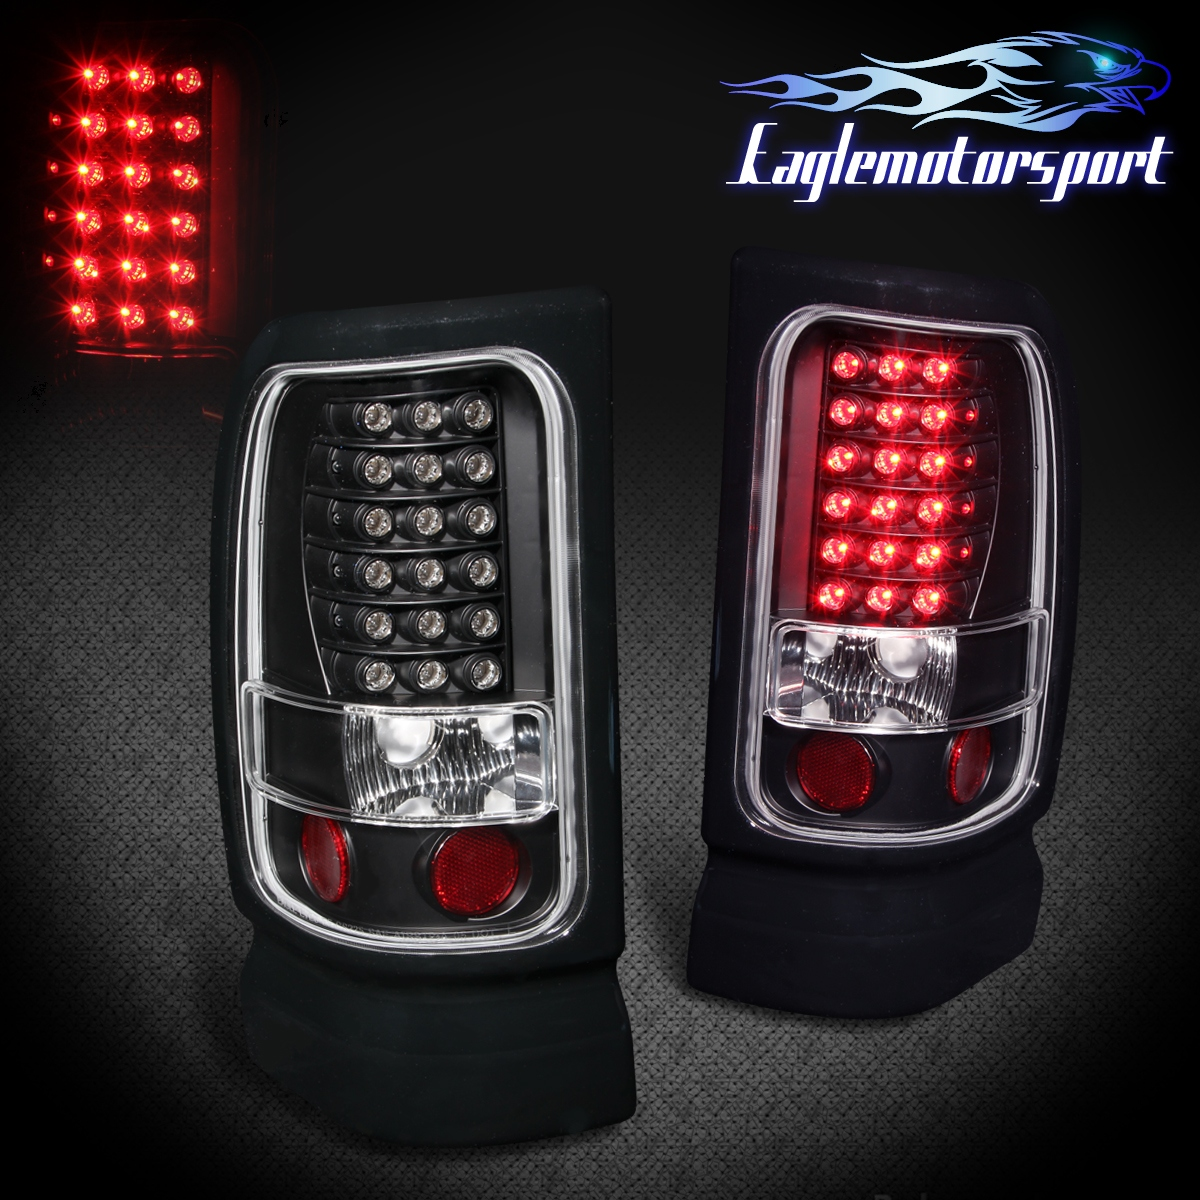 2001 Dodge Ram 1500 Headlights >> 1994-2001 Dodge Ram 1500/94-02 Ram 2500 3500 Black LED ...